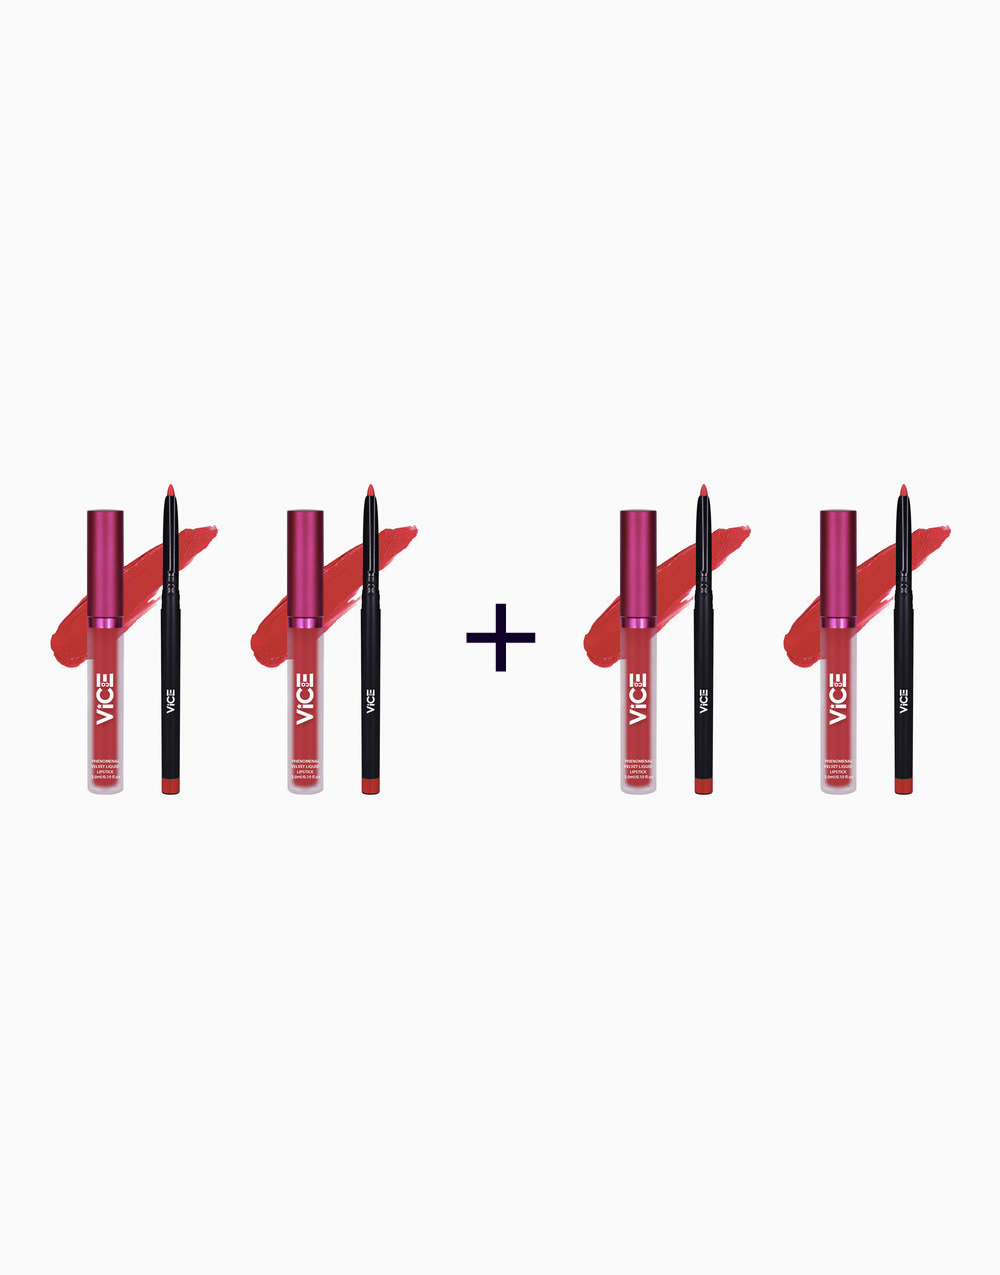 Phenomenal Velvet Lip Kit (3ml + 0.25g) (Buy 2, Take 2) by Vice Cosmetics   Givlavu